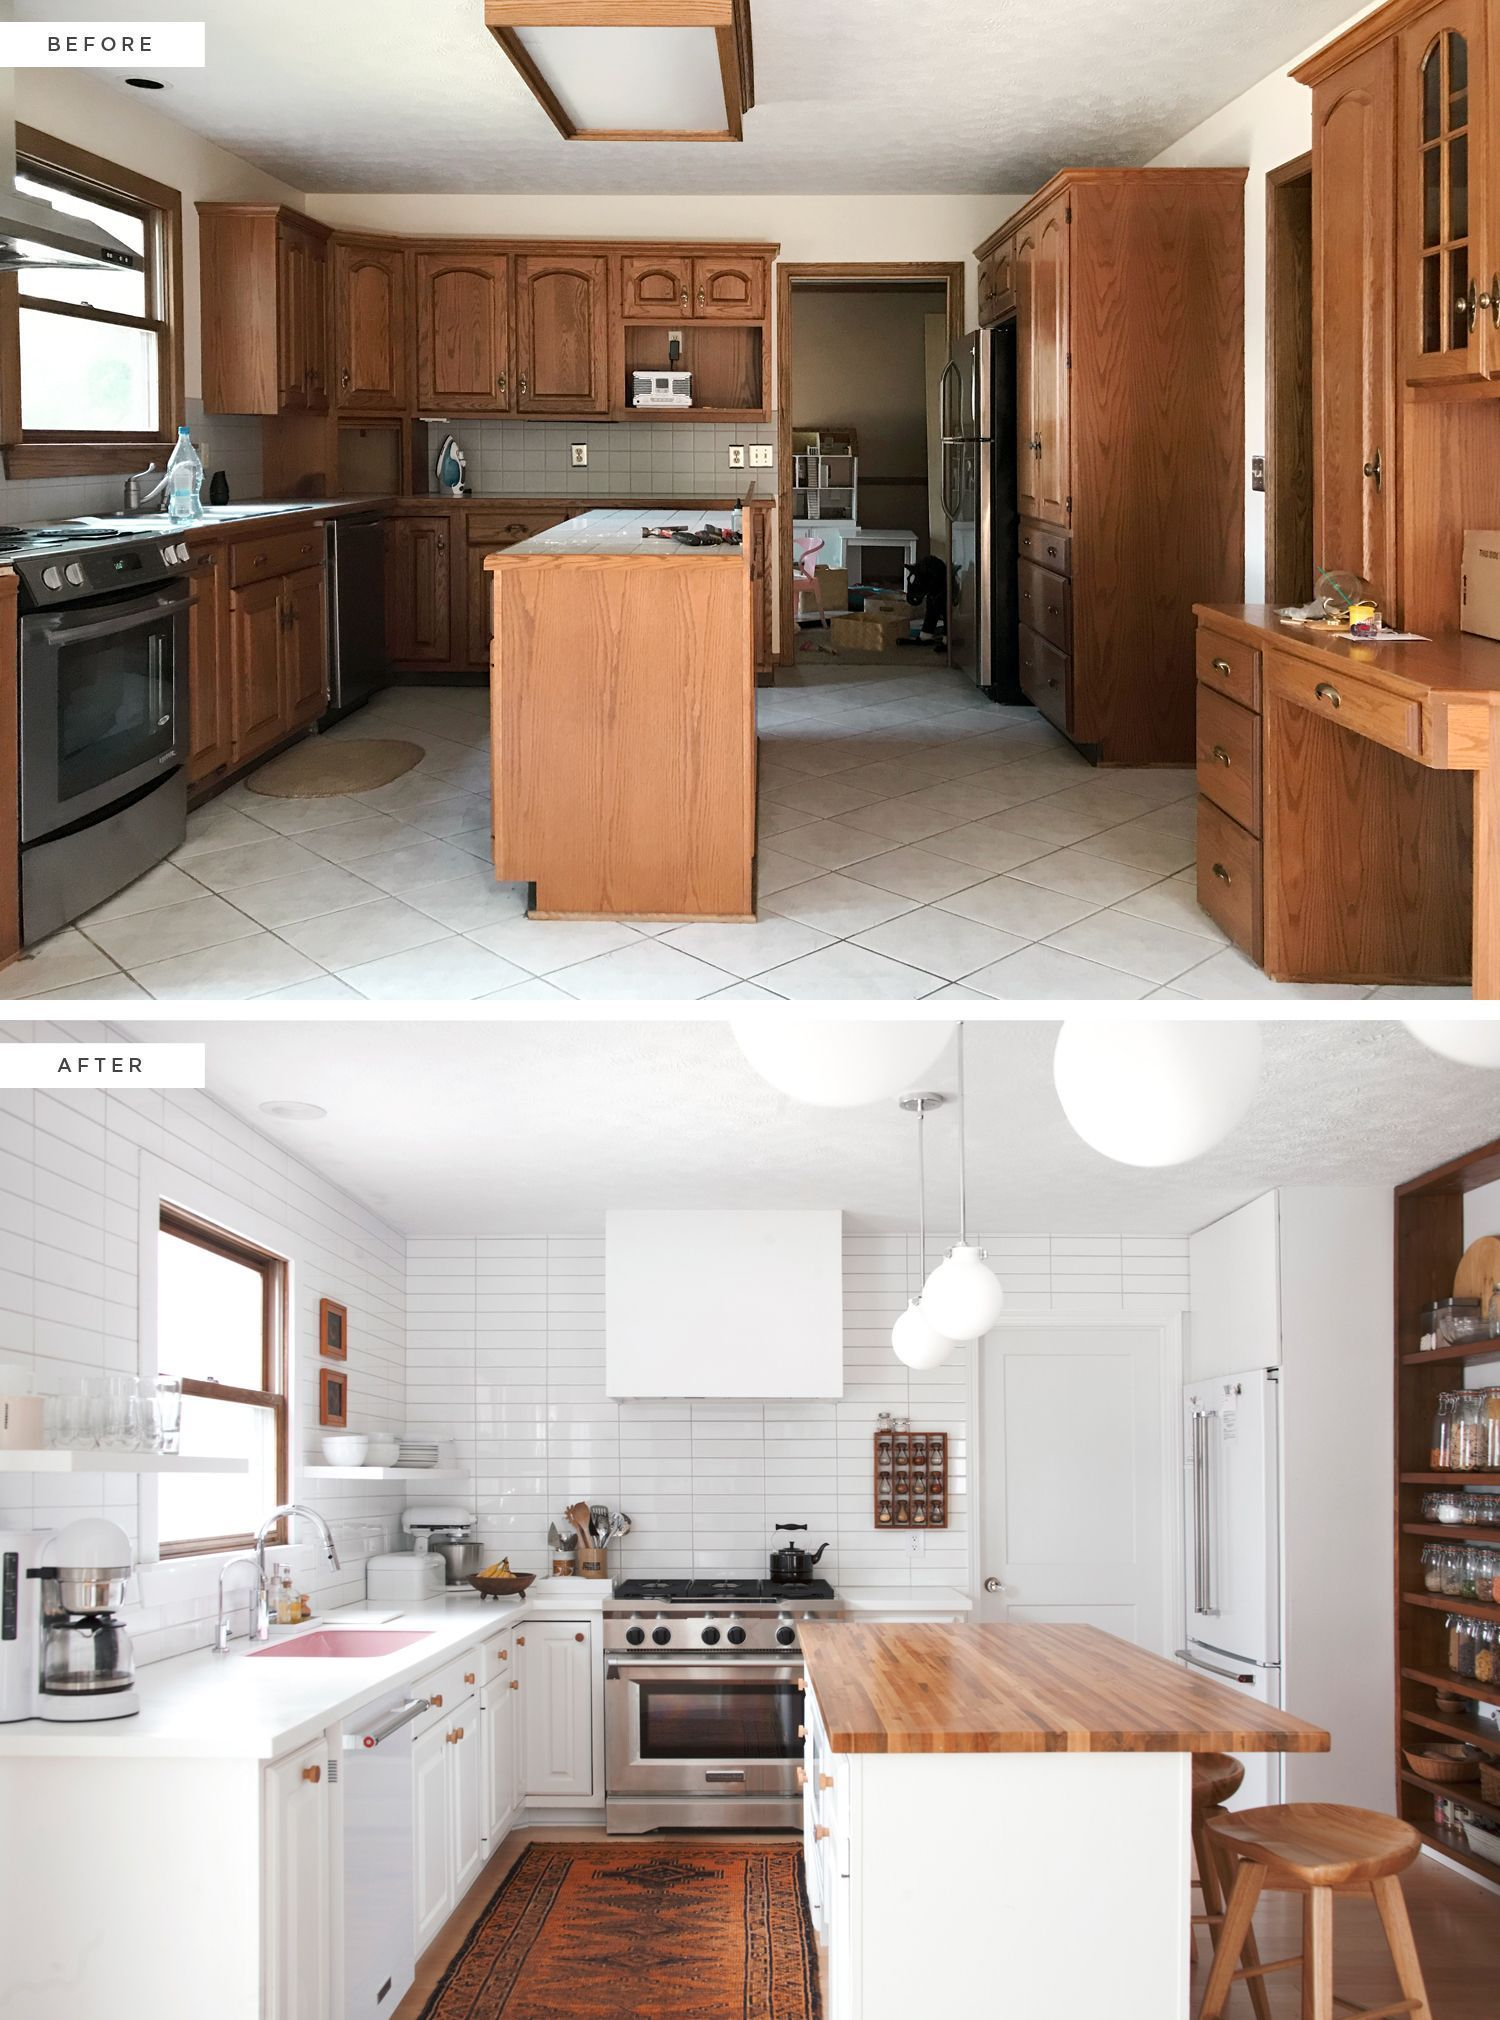 9 dumbfounding useful ideas minimalist decor bathroom inspiration colorful minimalist home stairs cozy minimalist